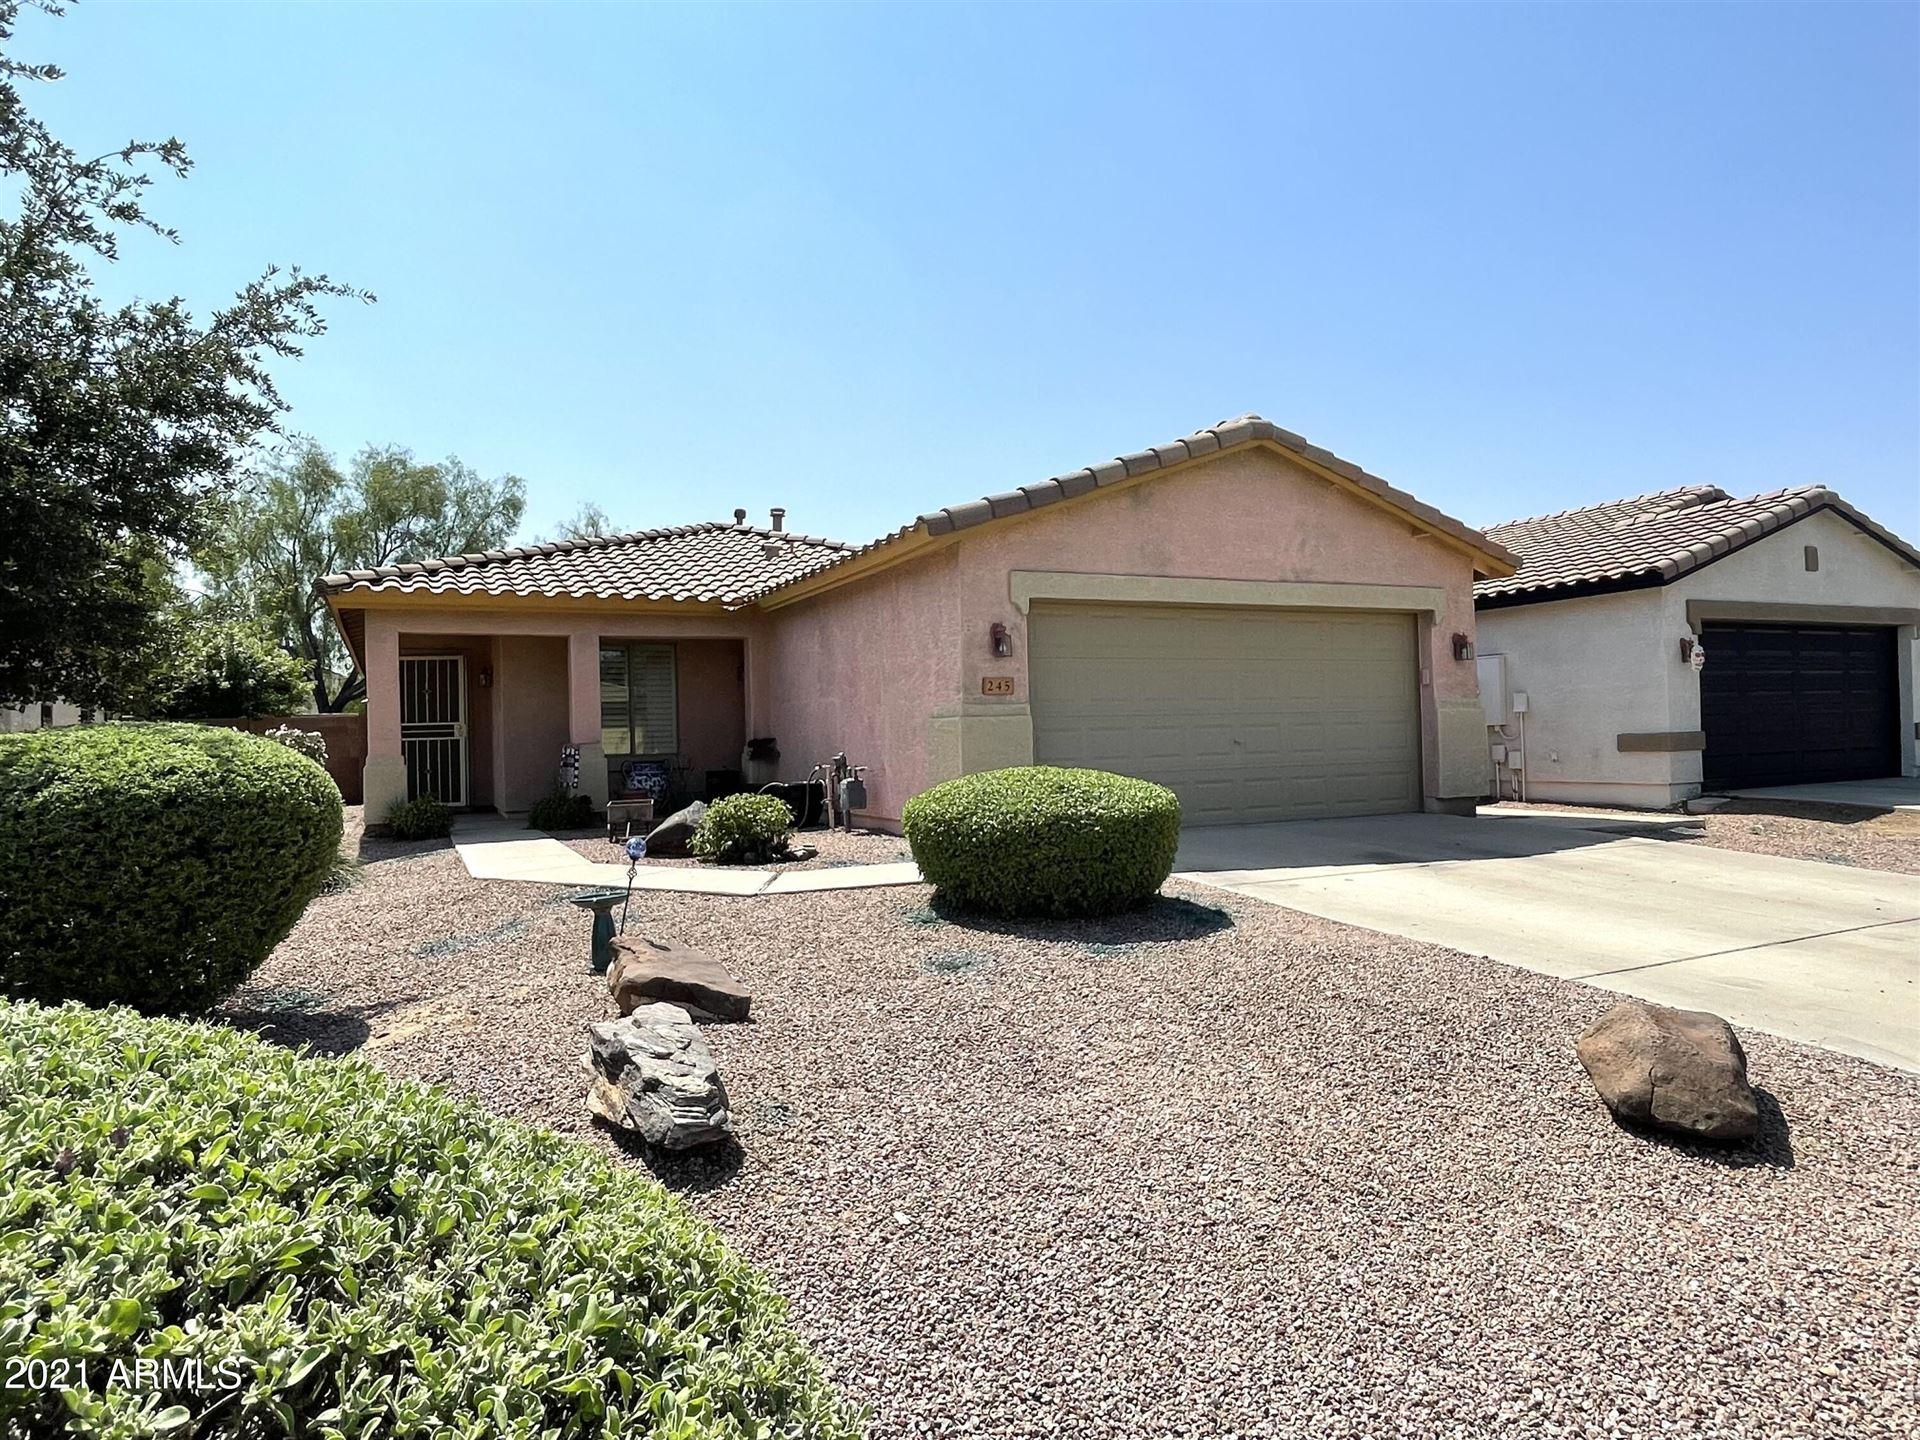 Photo of 245 W ANGUS Road, San Tan Valley, AZ 85143 (MLS # 6295451)